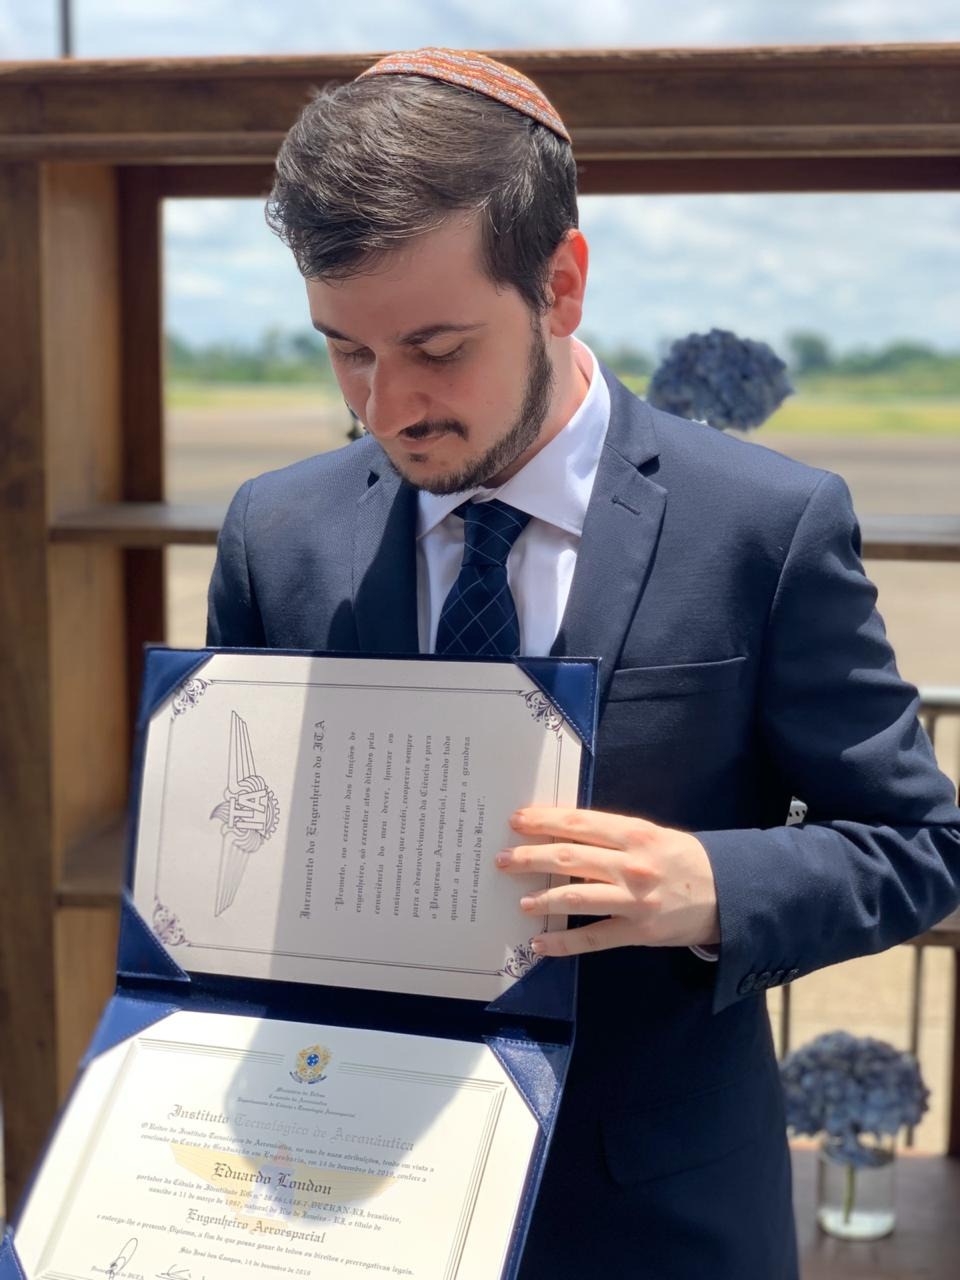 Eduardo London recebeu seu diploma de engenheiro aeroespacial do ITA